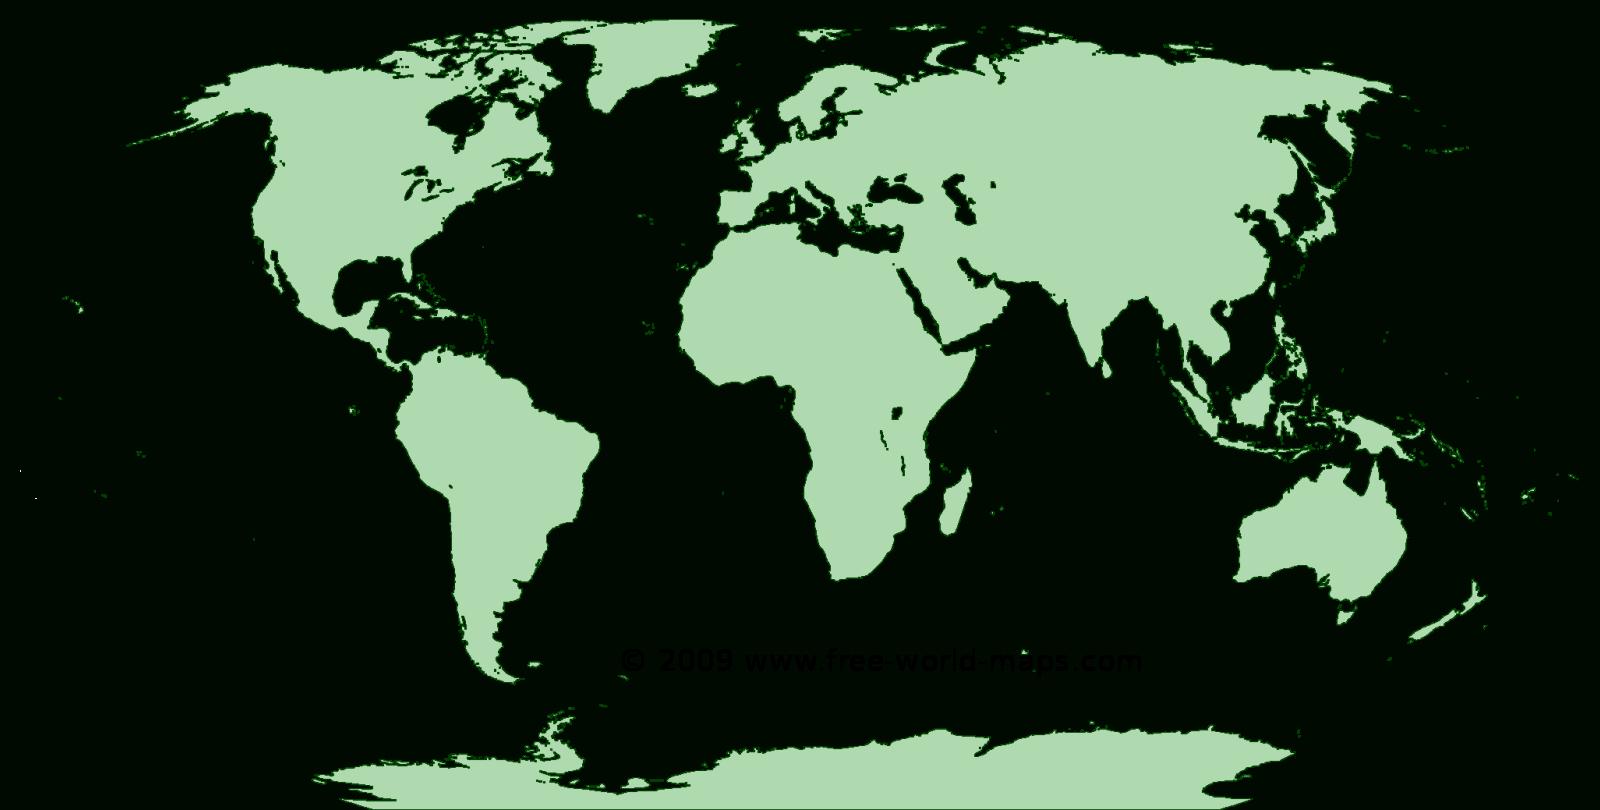 Printable Blank World Maps | Free World Maps - Free Printable World Maps Online